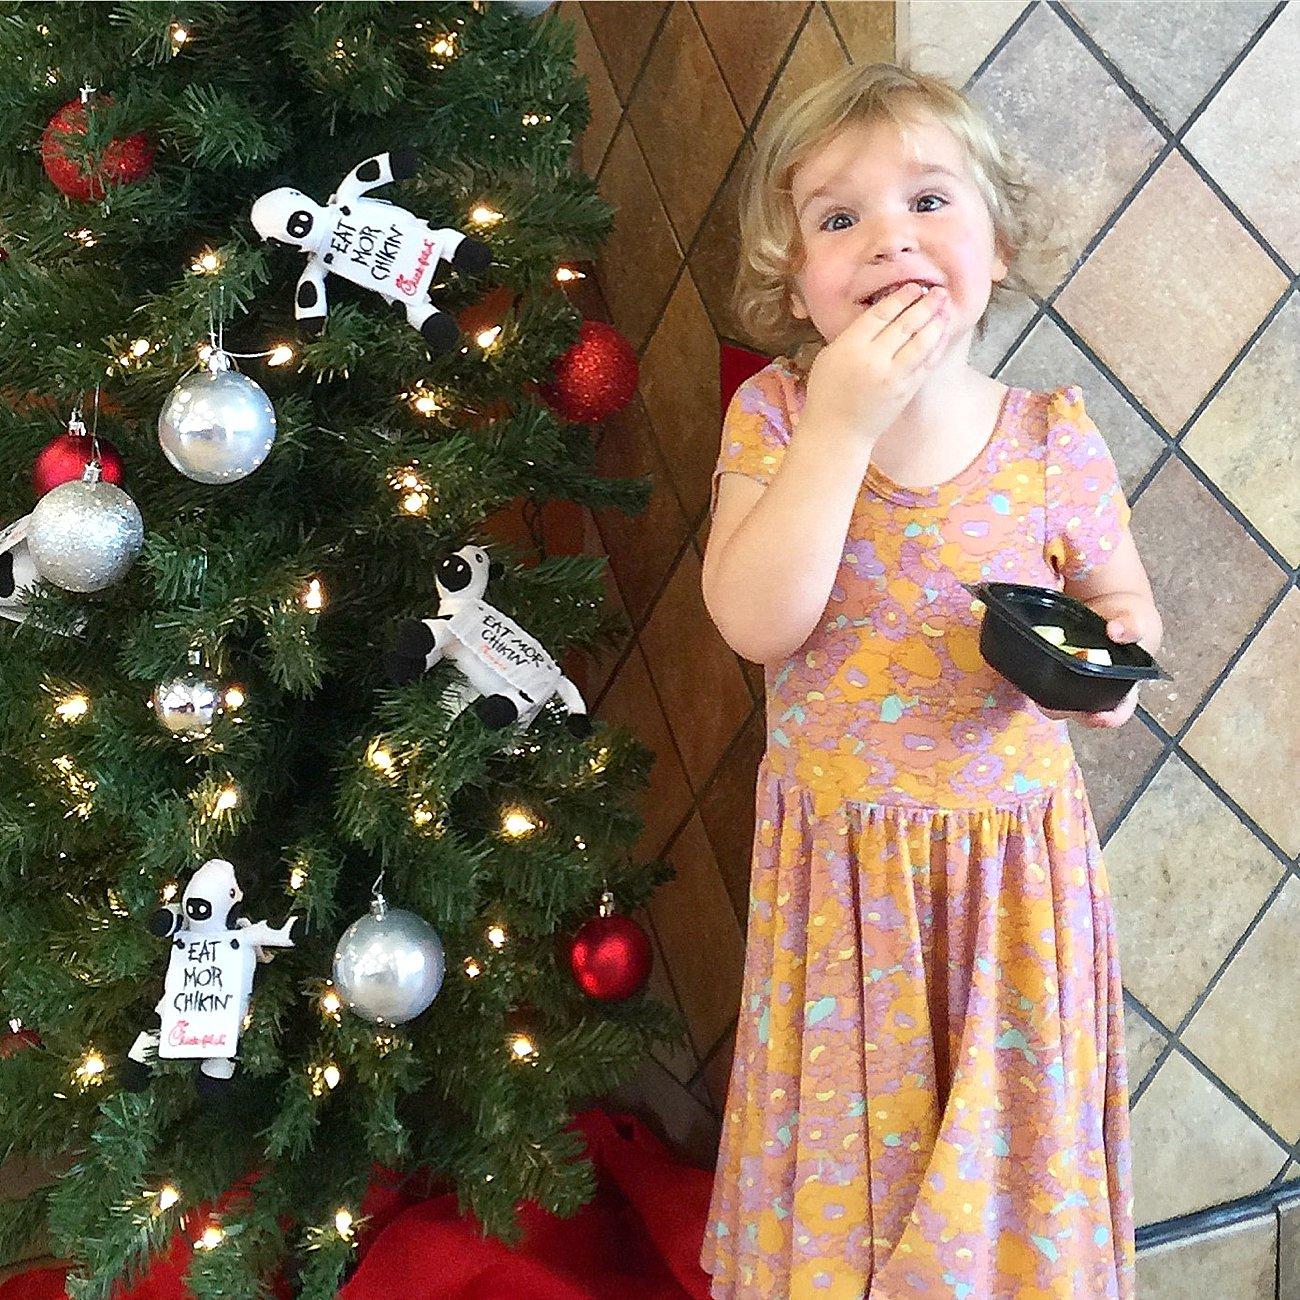 25 Random Acts of Christmas Kindness - Kindness Advent 2016 | Recap #trikind25 #kindnessadvent #25daysofkindness (8)